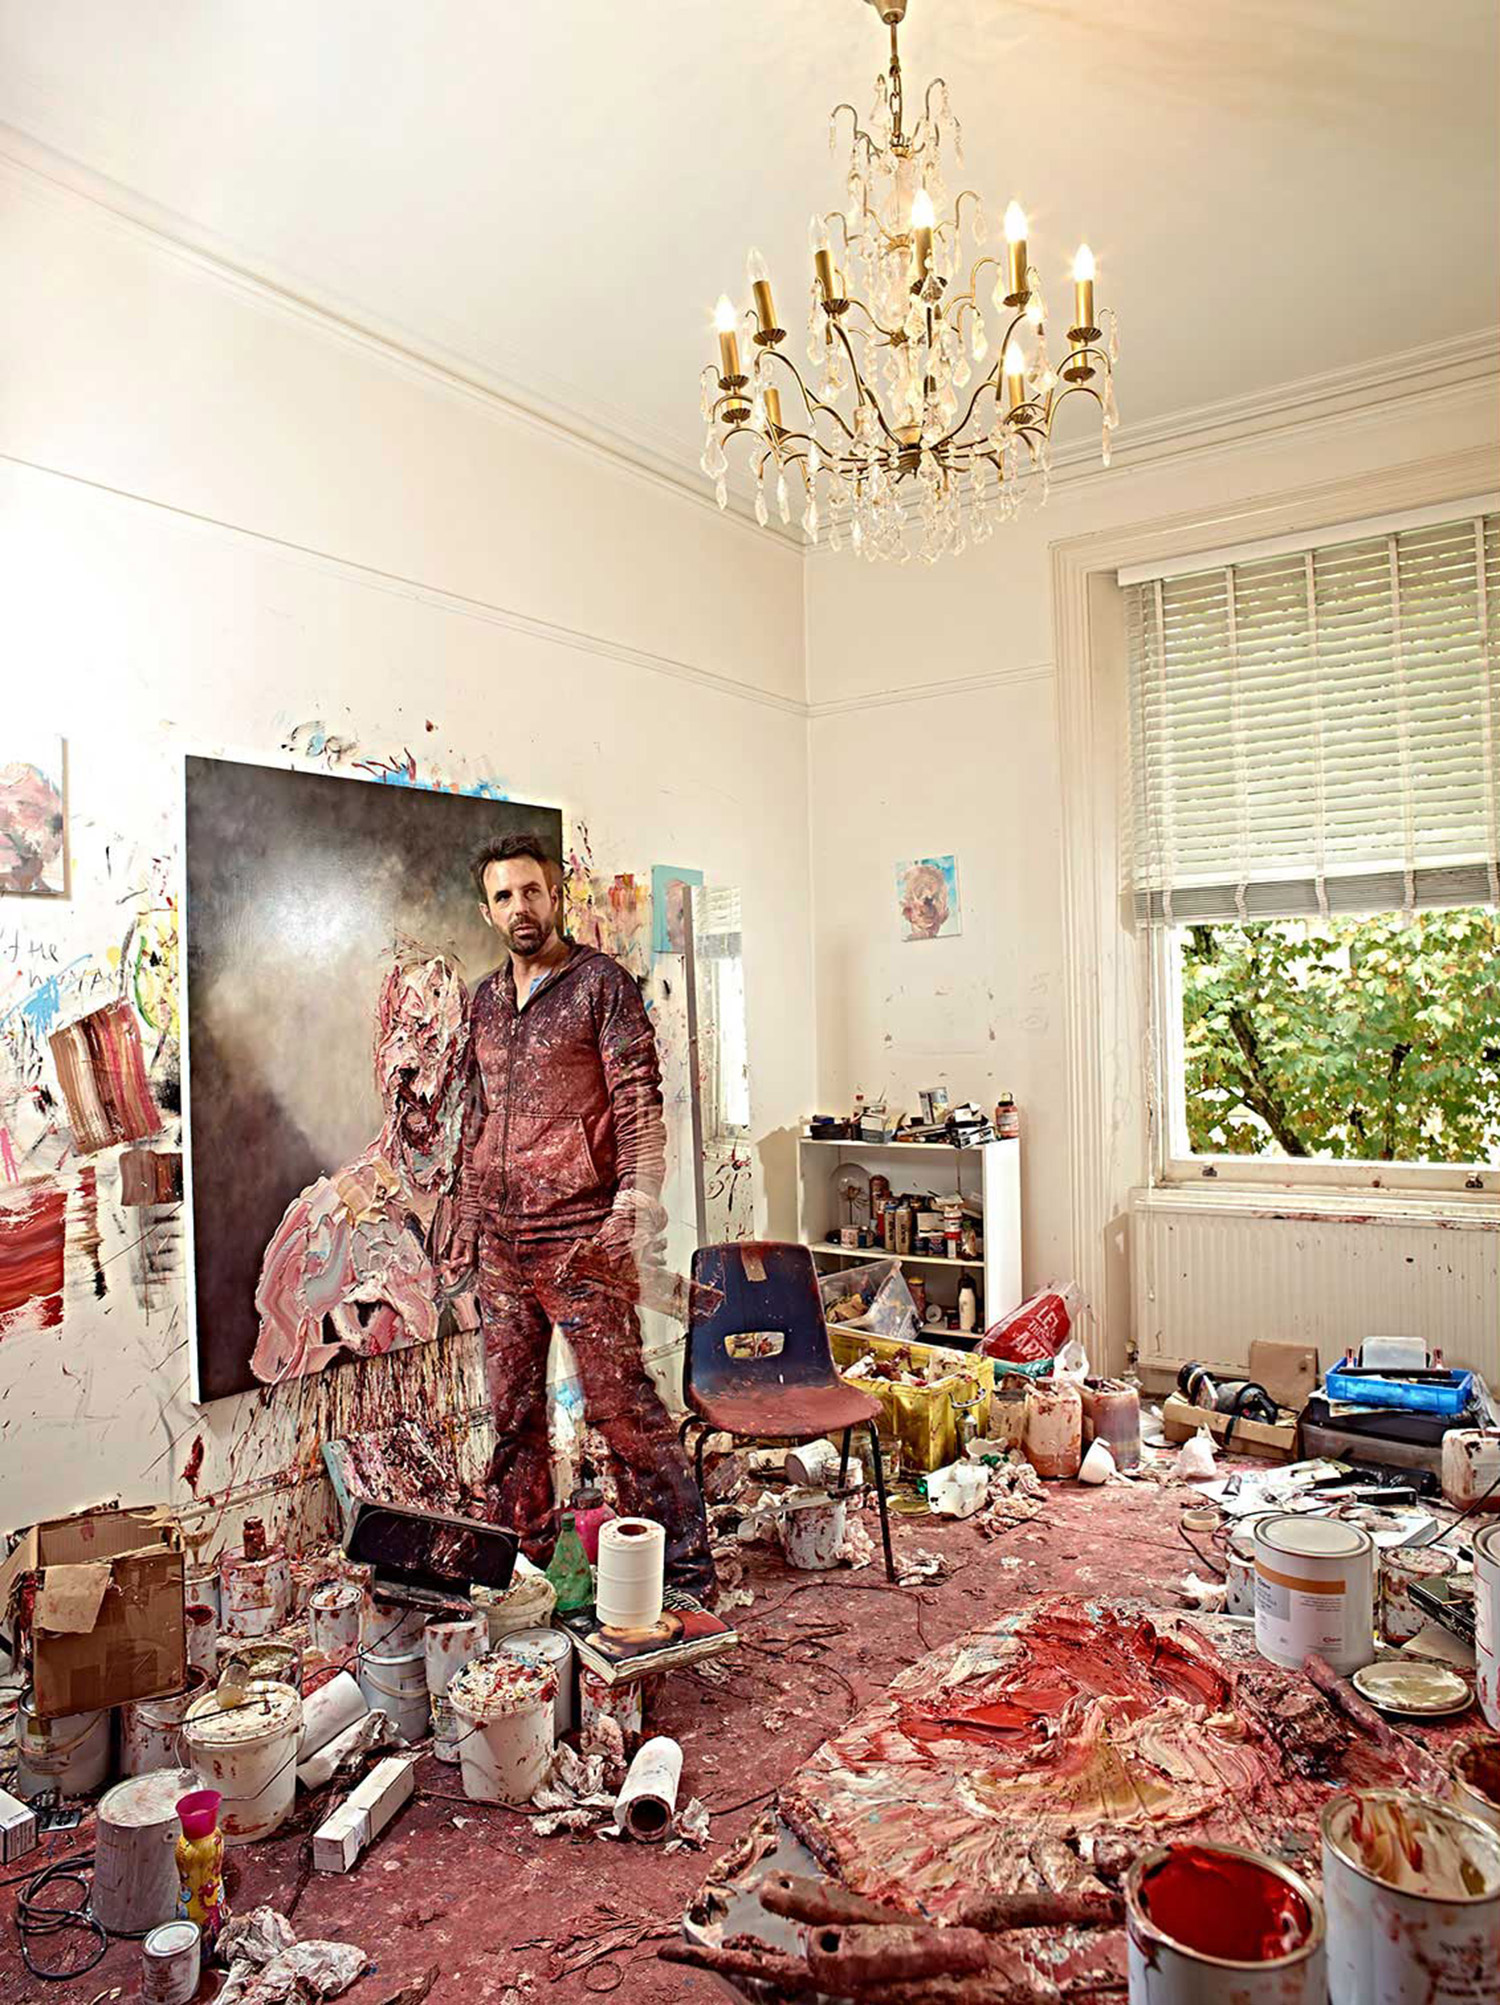 Antony Micallef - artist in studio